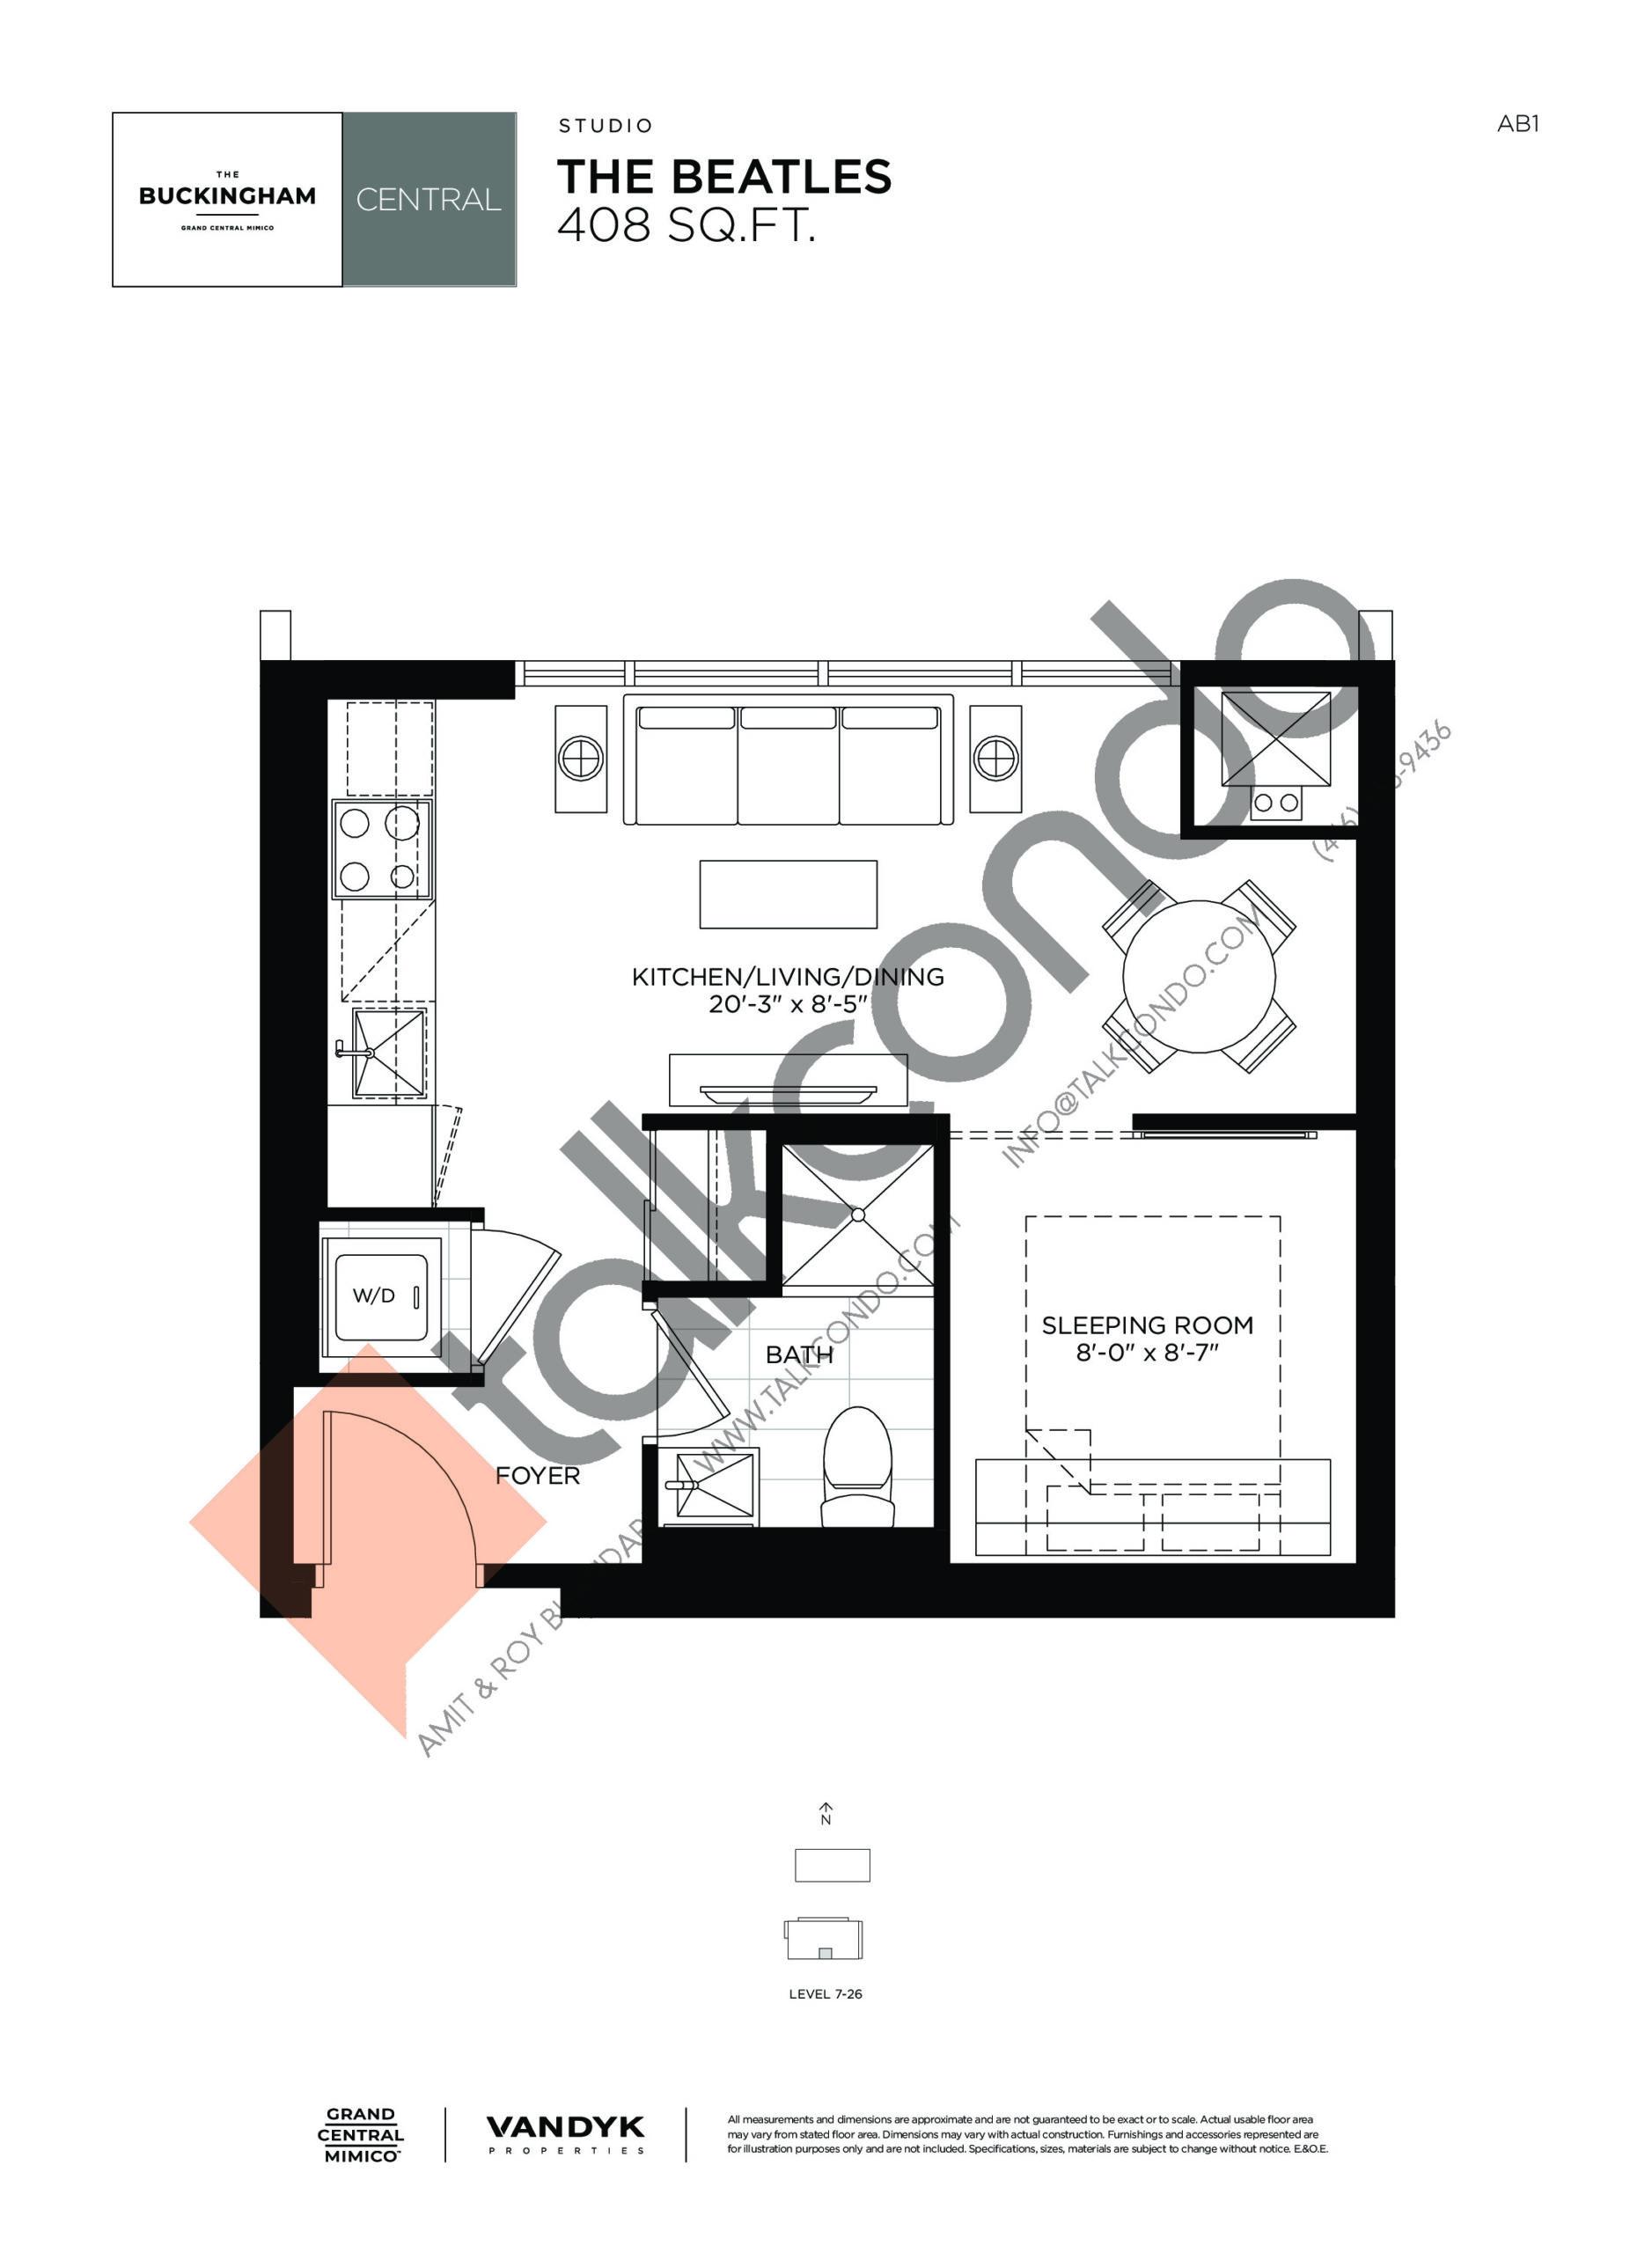 The Beatles Floor Plan at Grand Central Mimico Condos - 408 sq.ft